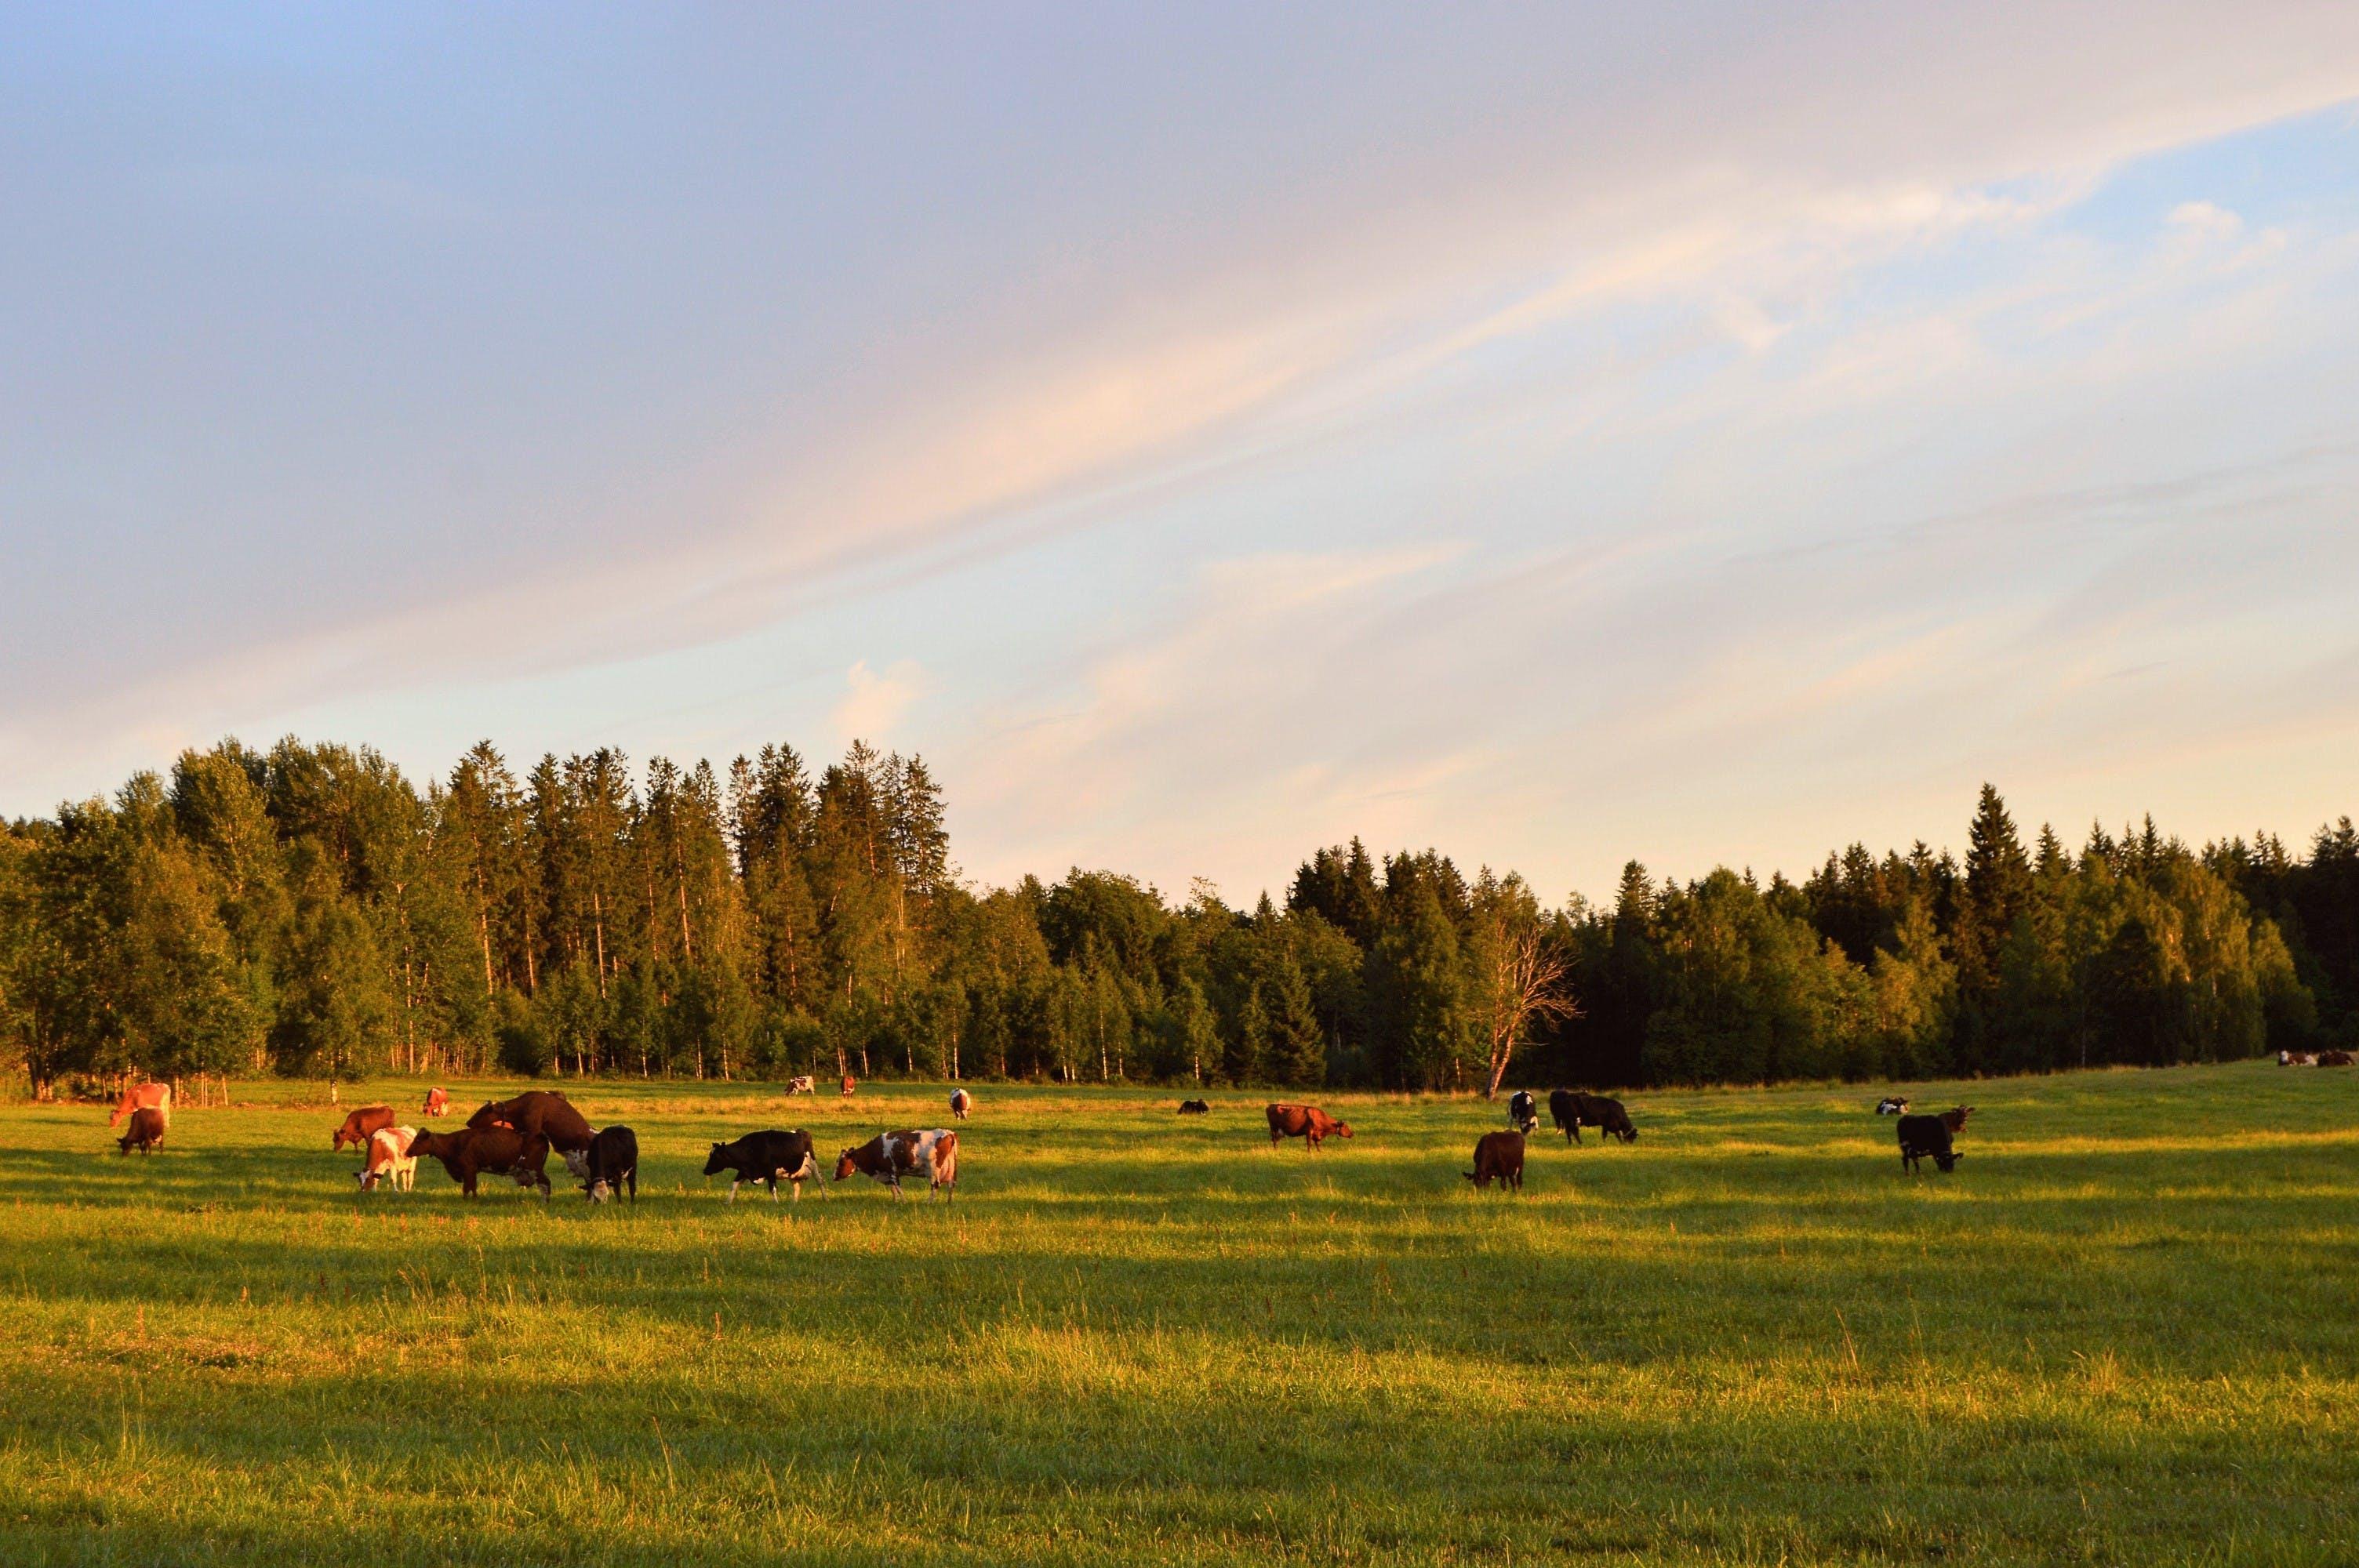 Herd of Cattle on the Field